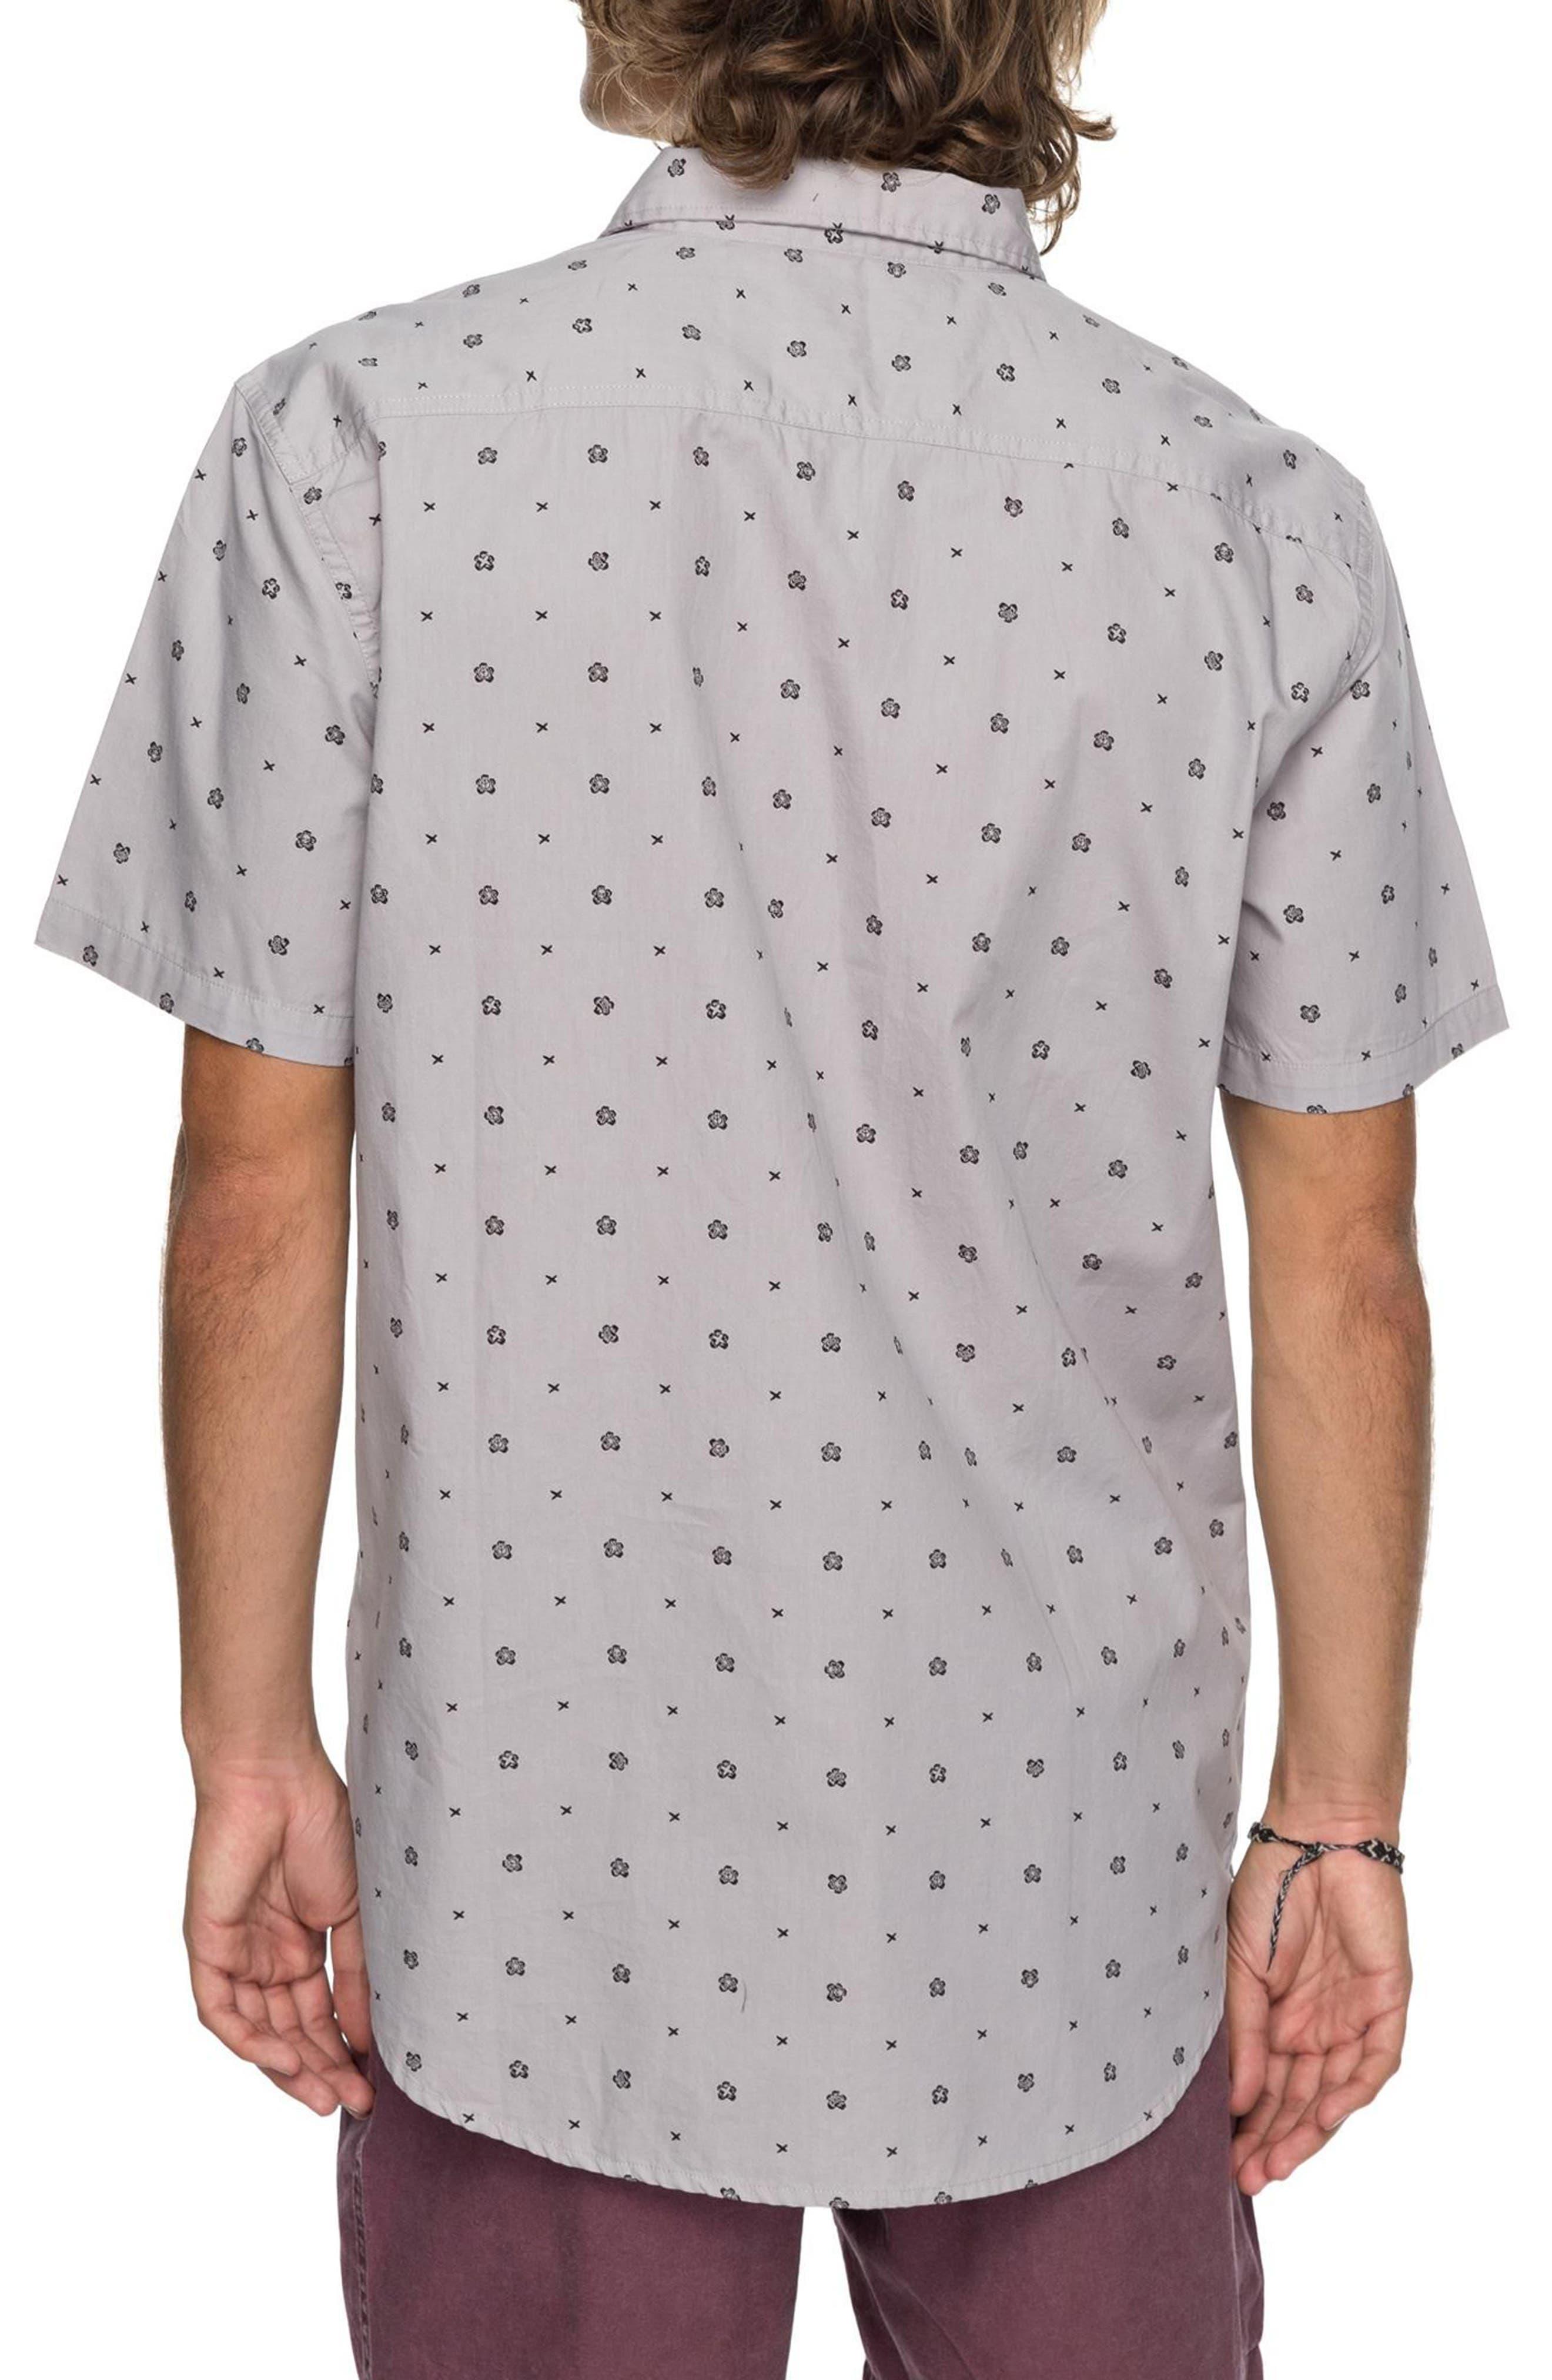 Kamanoa Short Sleeve Shirt,                             Alternate thumbnail 2, color,                             Silver Sconce